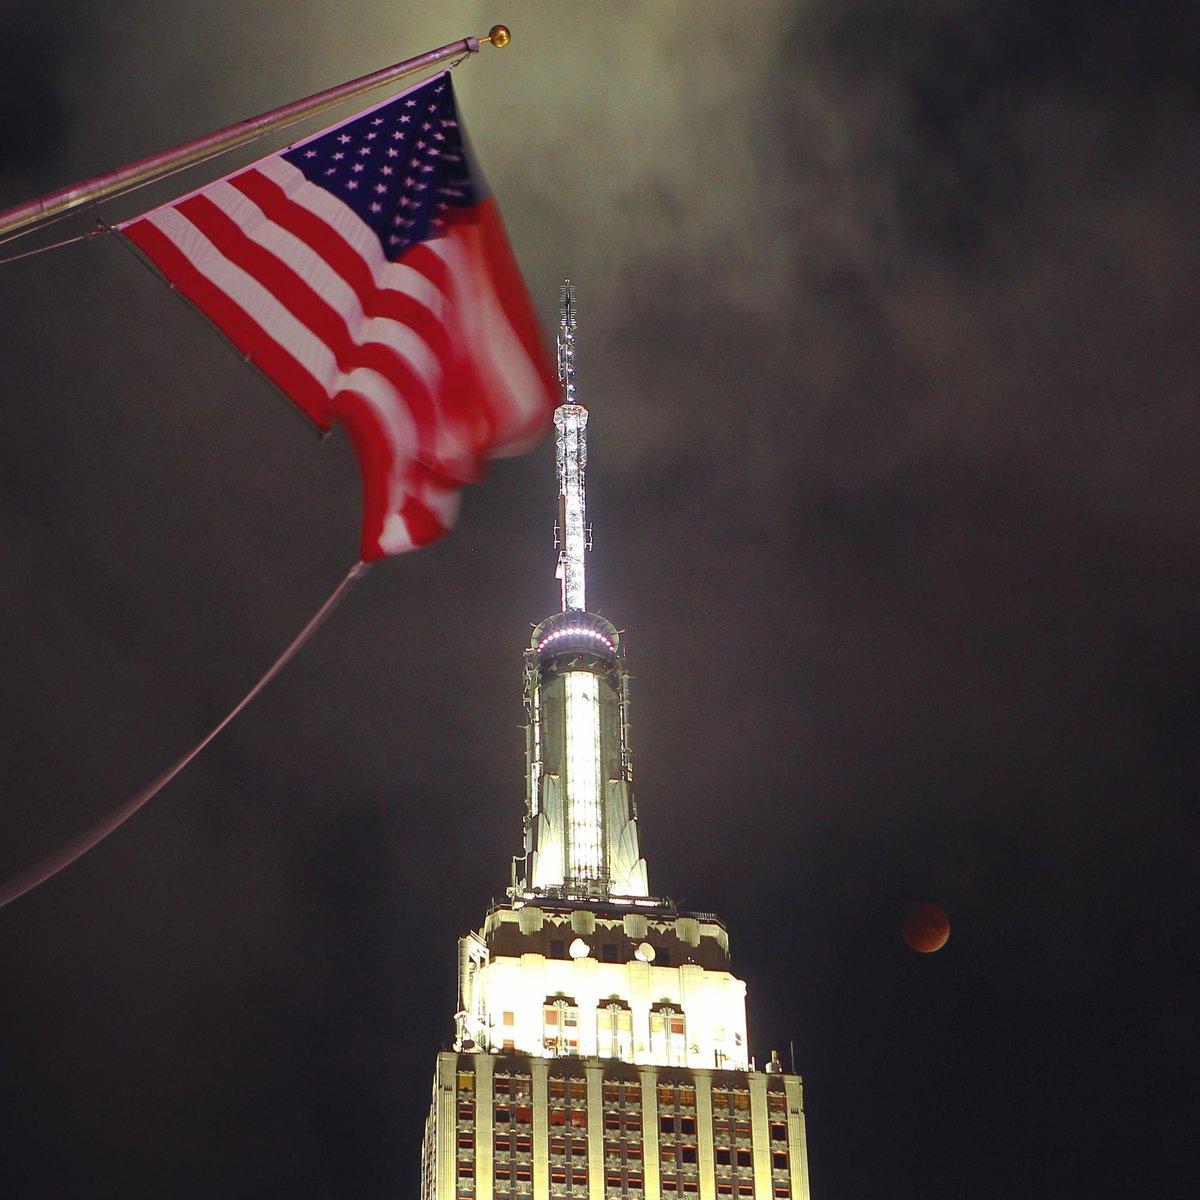 The #SuperBloodMoon over @EmpireStateBldg tonight #newyork #newyorkcity @nyc @newyork @EverythingNYC #LunarEclipse http://t.co/Kg2cZ7LpAd